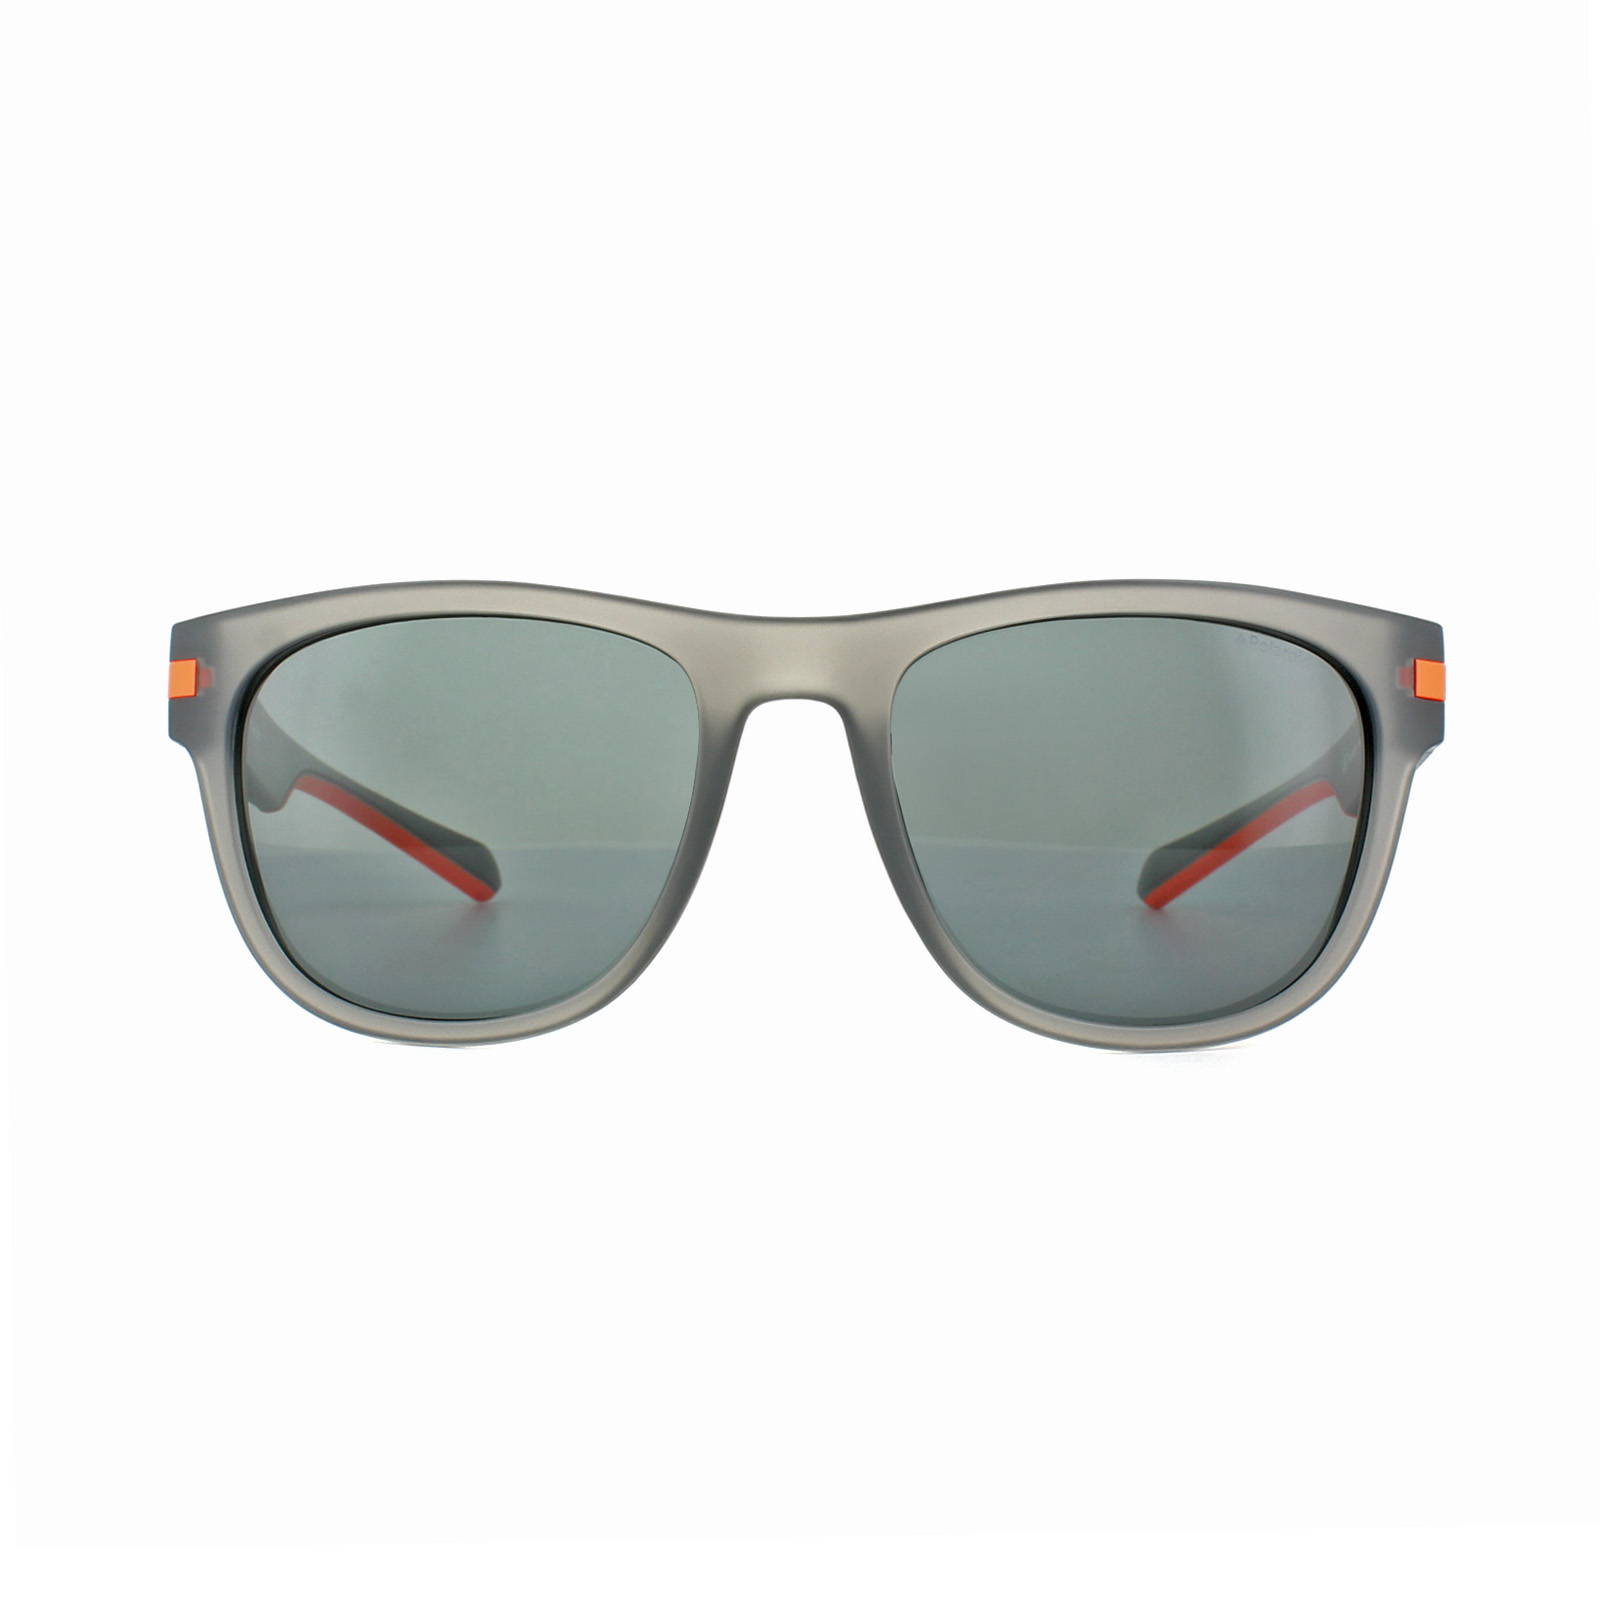 Sentinel Polaroid Sunglasses PLD 2065 S RIW M9 Matt Grey Orange Grey  Polarized. Sentinel Thumbnail 3 95951f89401